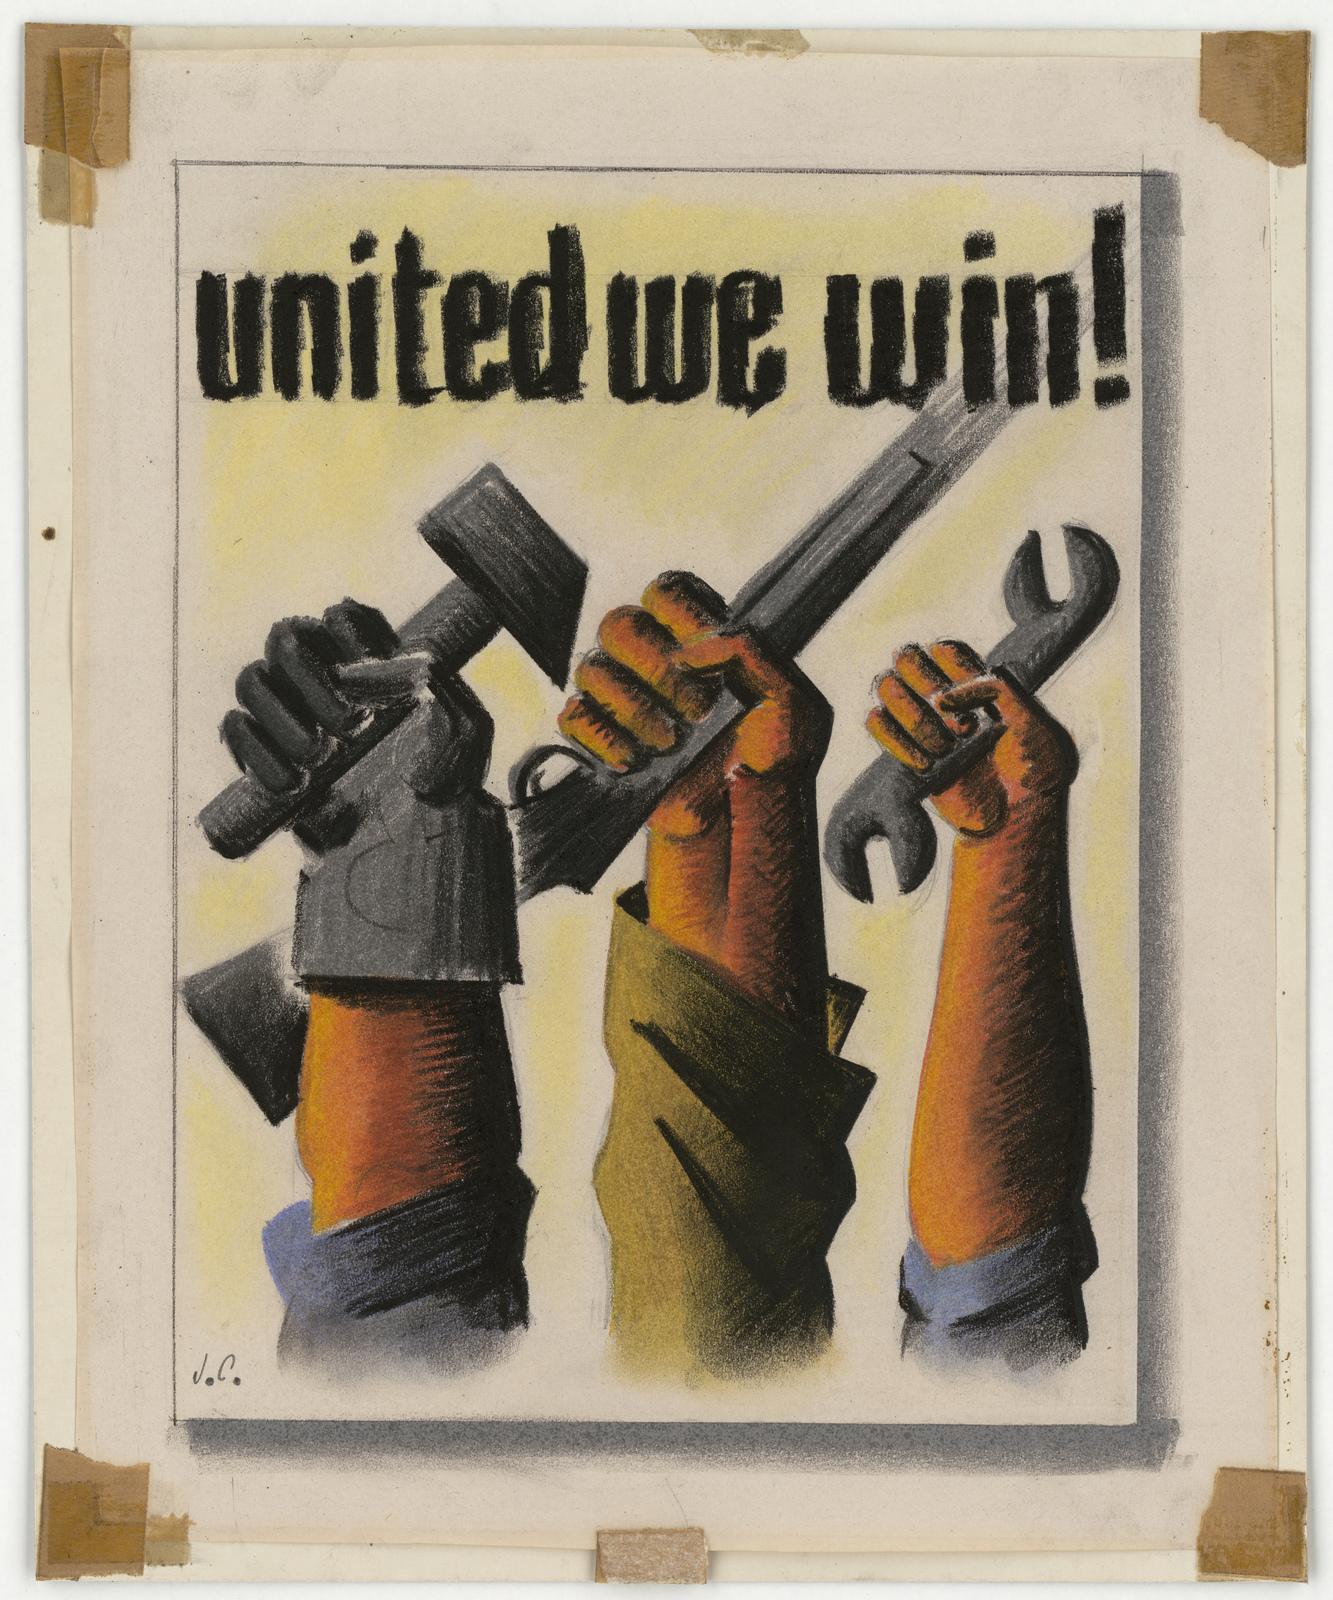 United We Win! [J.C]